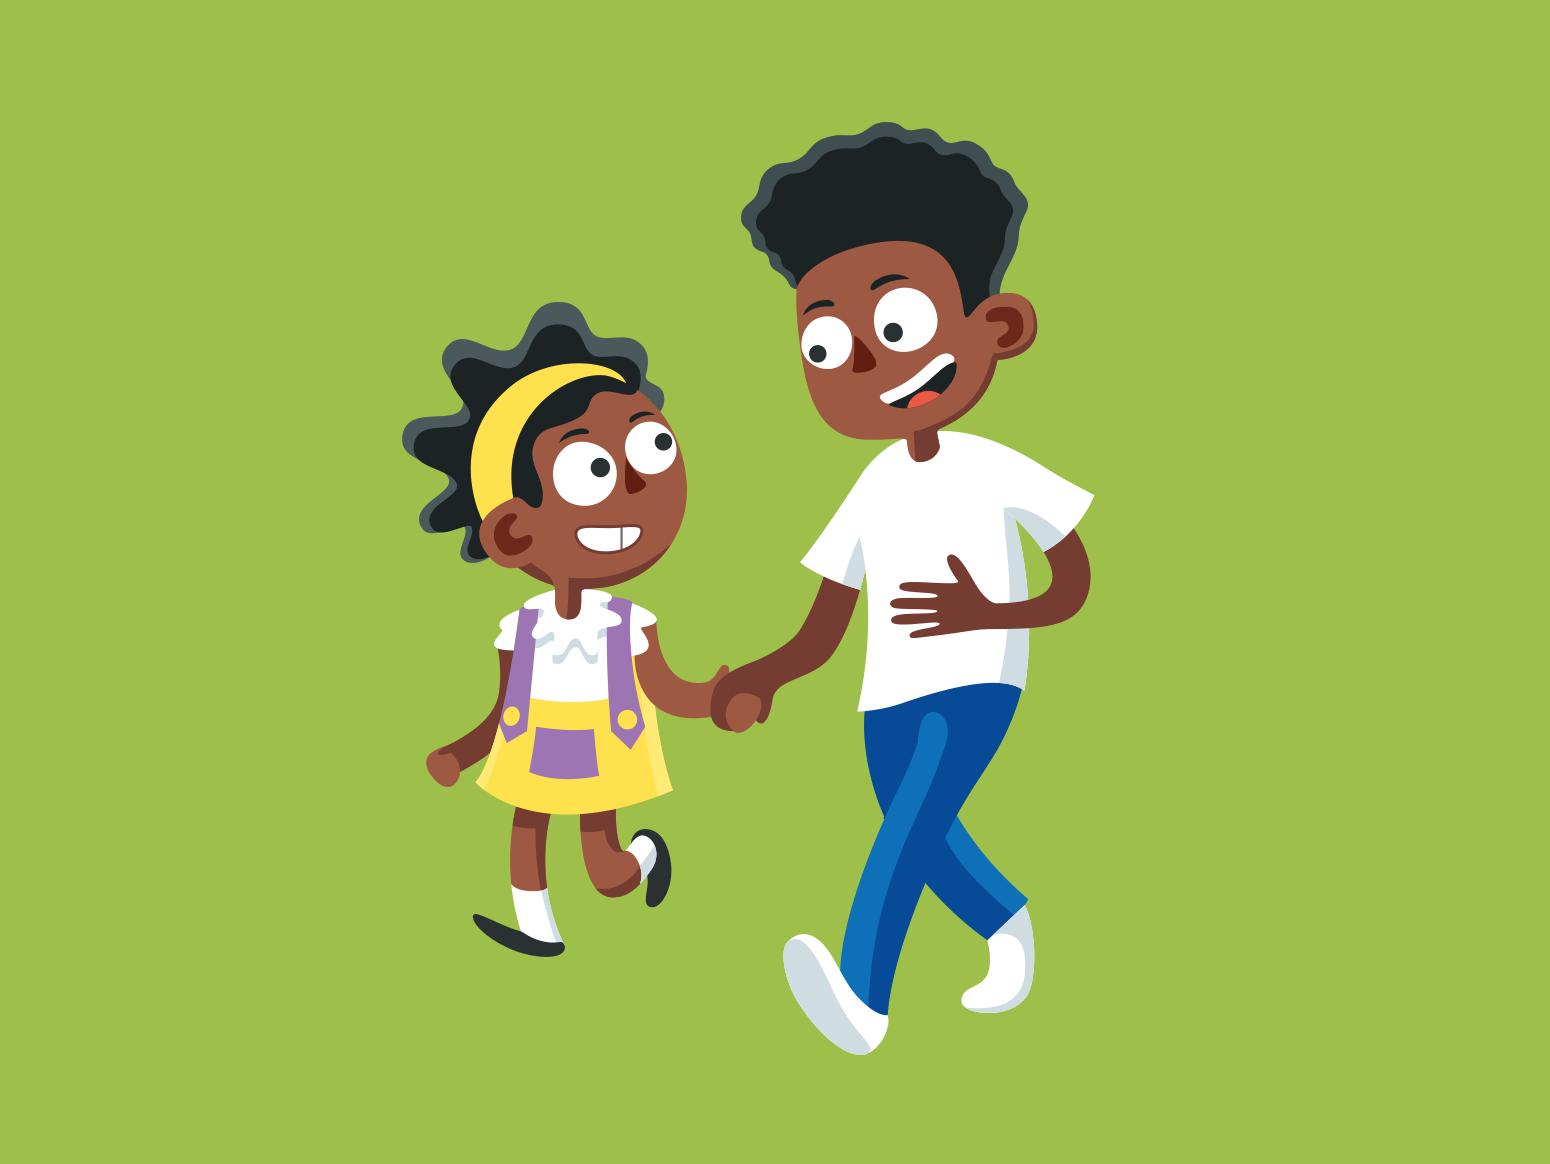 Brother and Sister colour childrens book children book illustration childrens illustration cartoon charcter digital art illustration vector illustrator